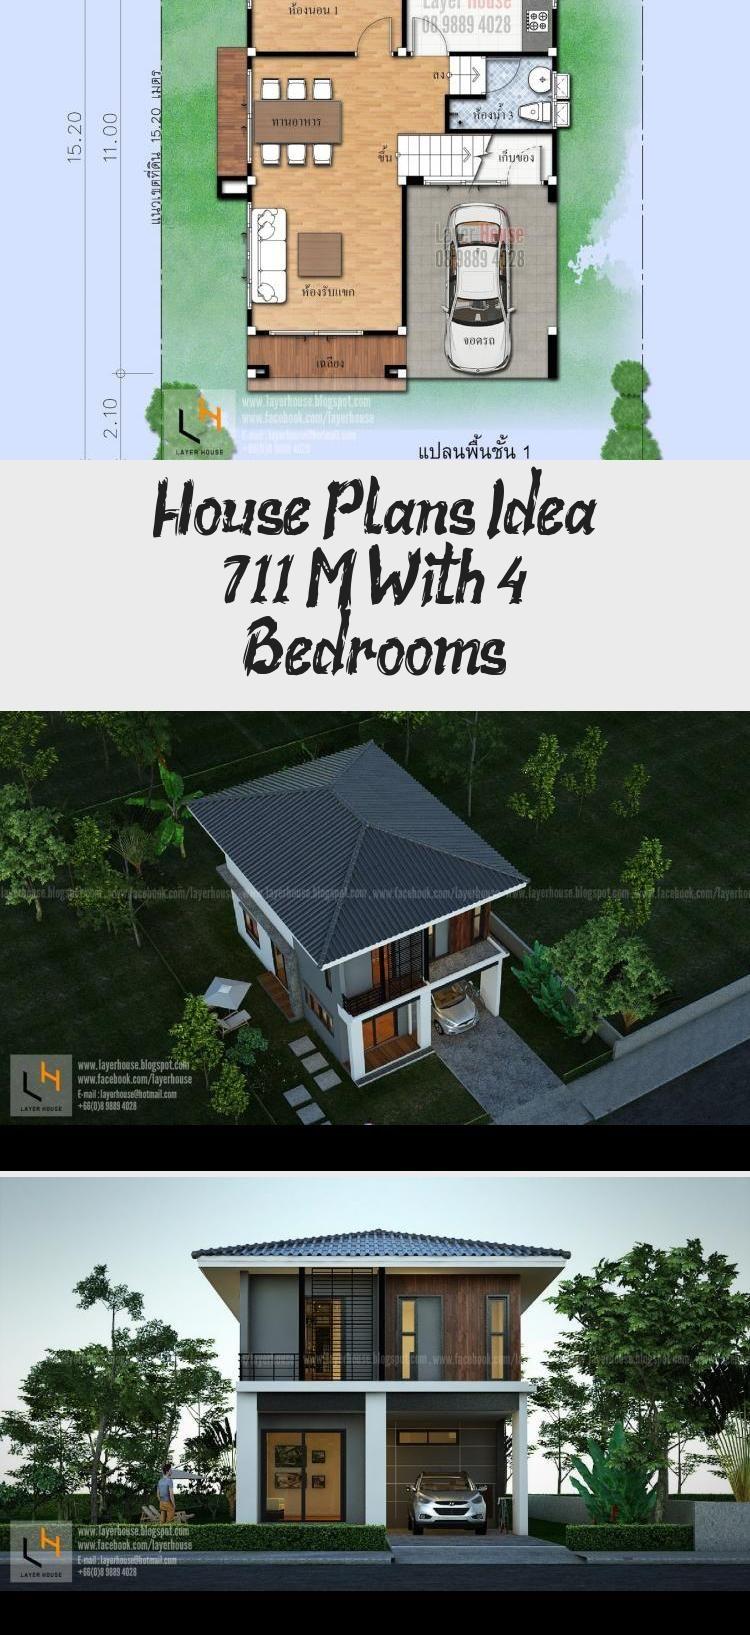 House Plans Idea 7x11 M With 4 Bedrooms Sam House Plans Smallhouseplans500sqft Smallhouseplans3bedroom Smallhous In 2020 House Plans Small House Small House Plans